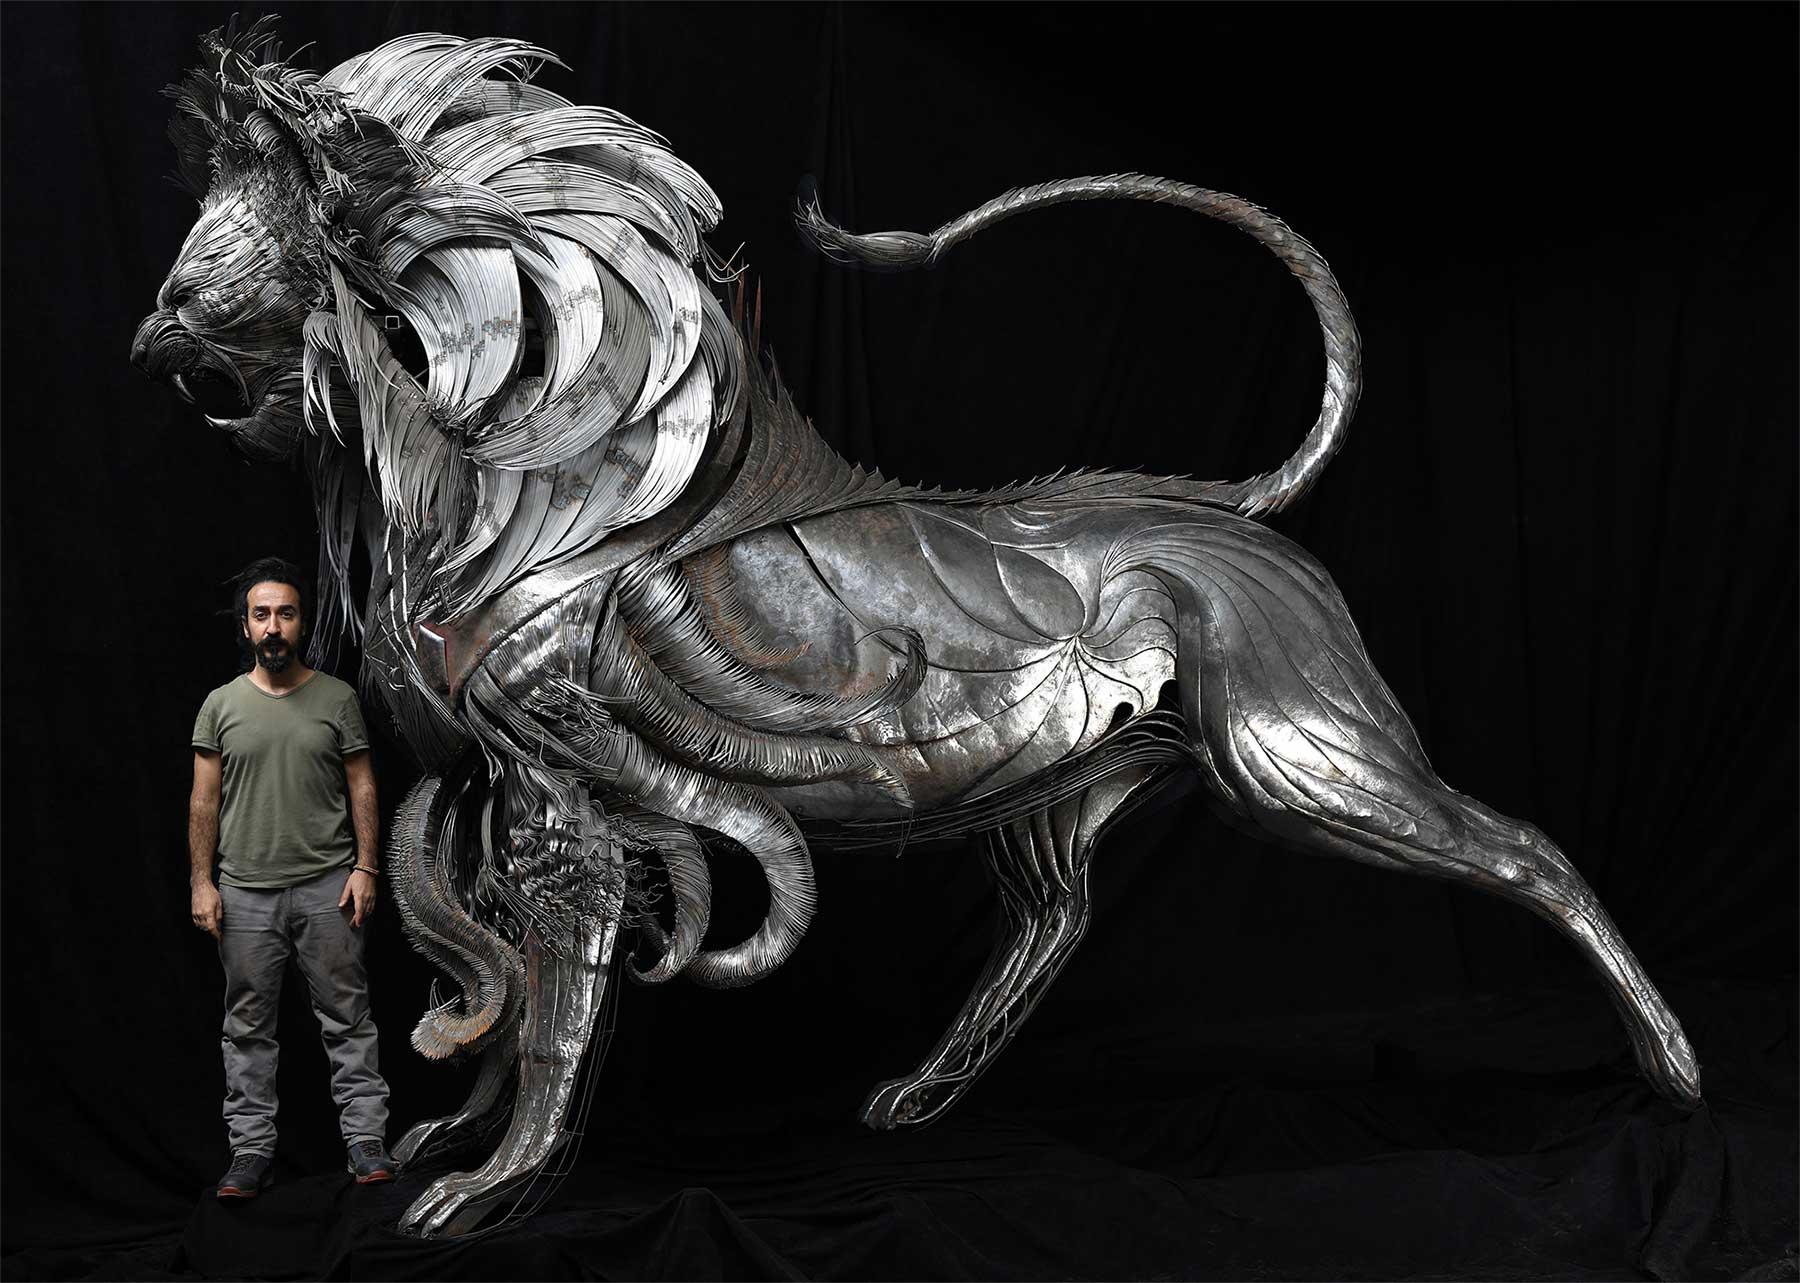 Geniale Altmetall-Skulpturen von Selçuk Yılmaz selcuk-yilmaz-metallskulpturen-2020_04